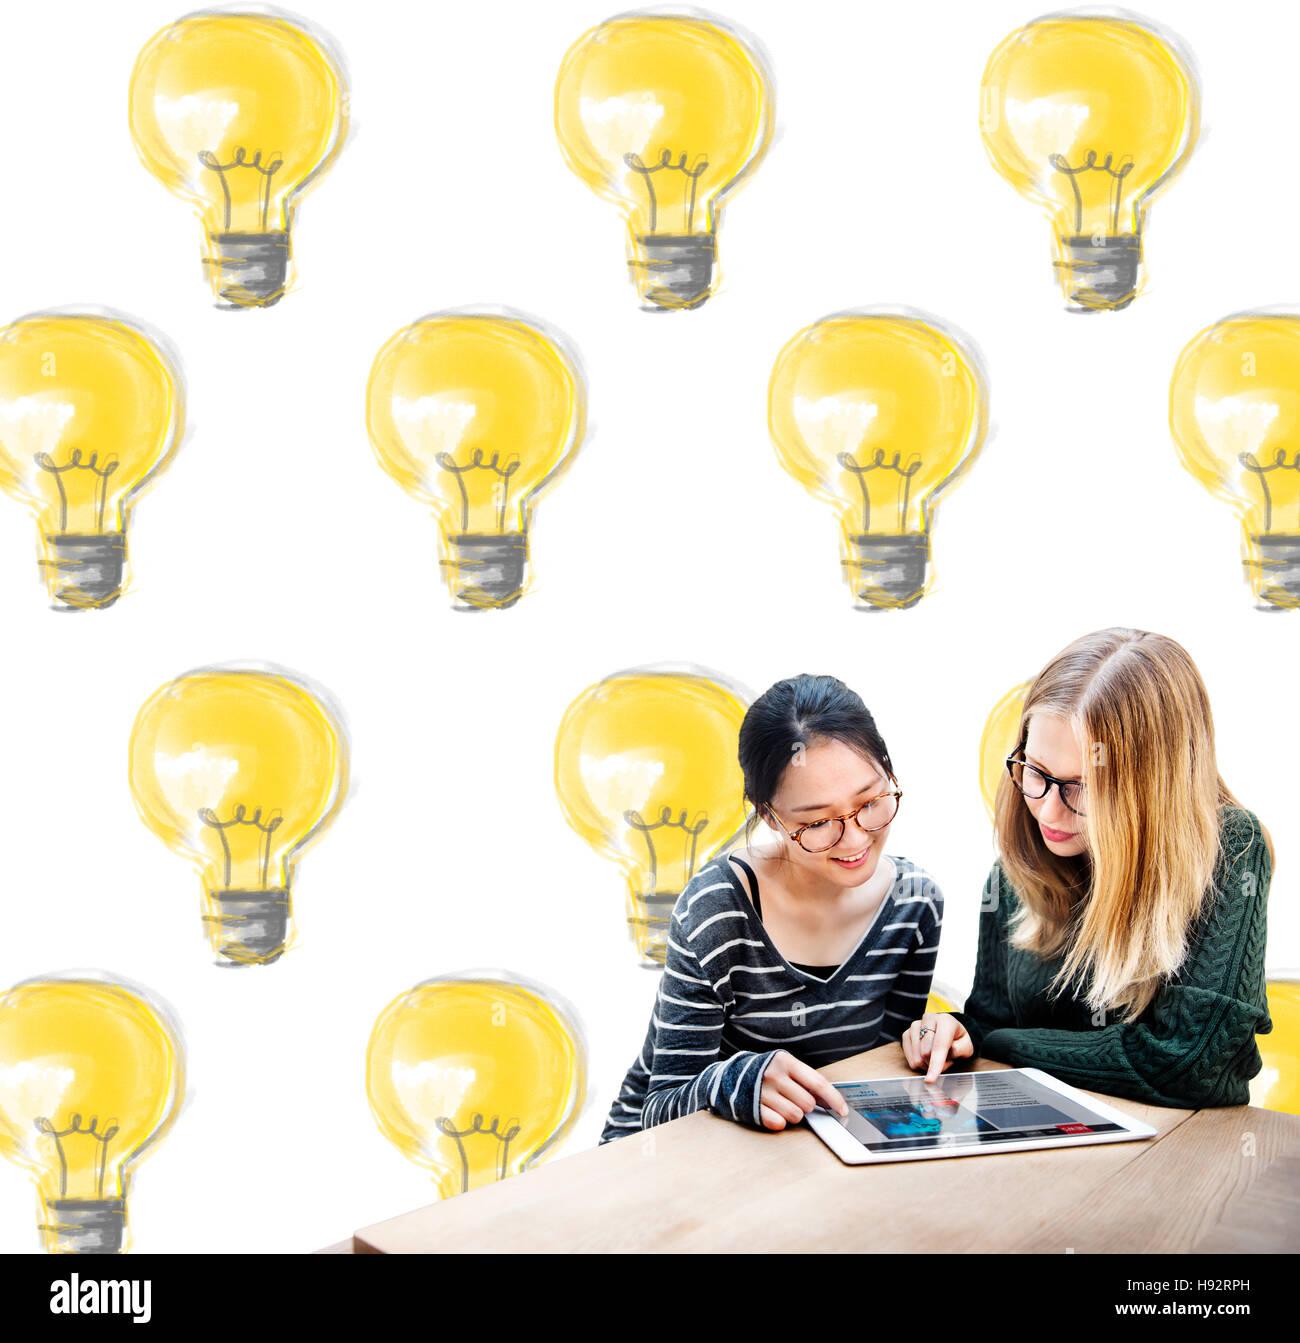 Lampe Strom Beleuchtung Idee Lichtkonzept Stockbild